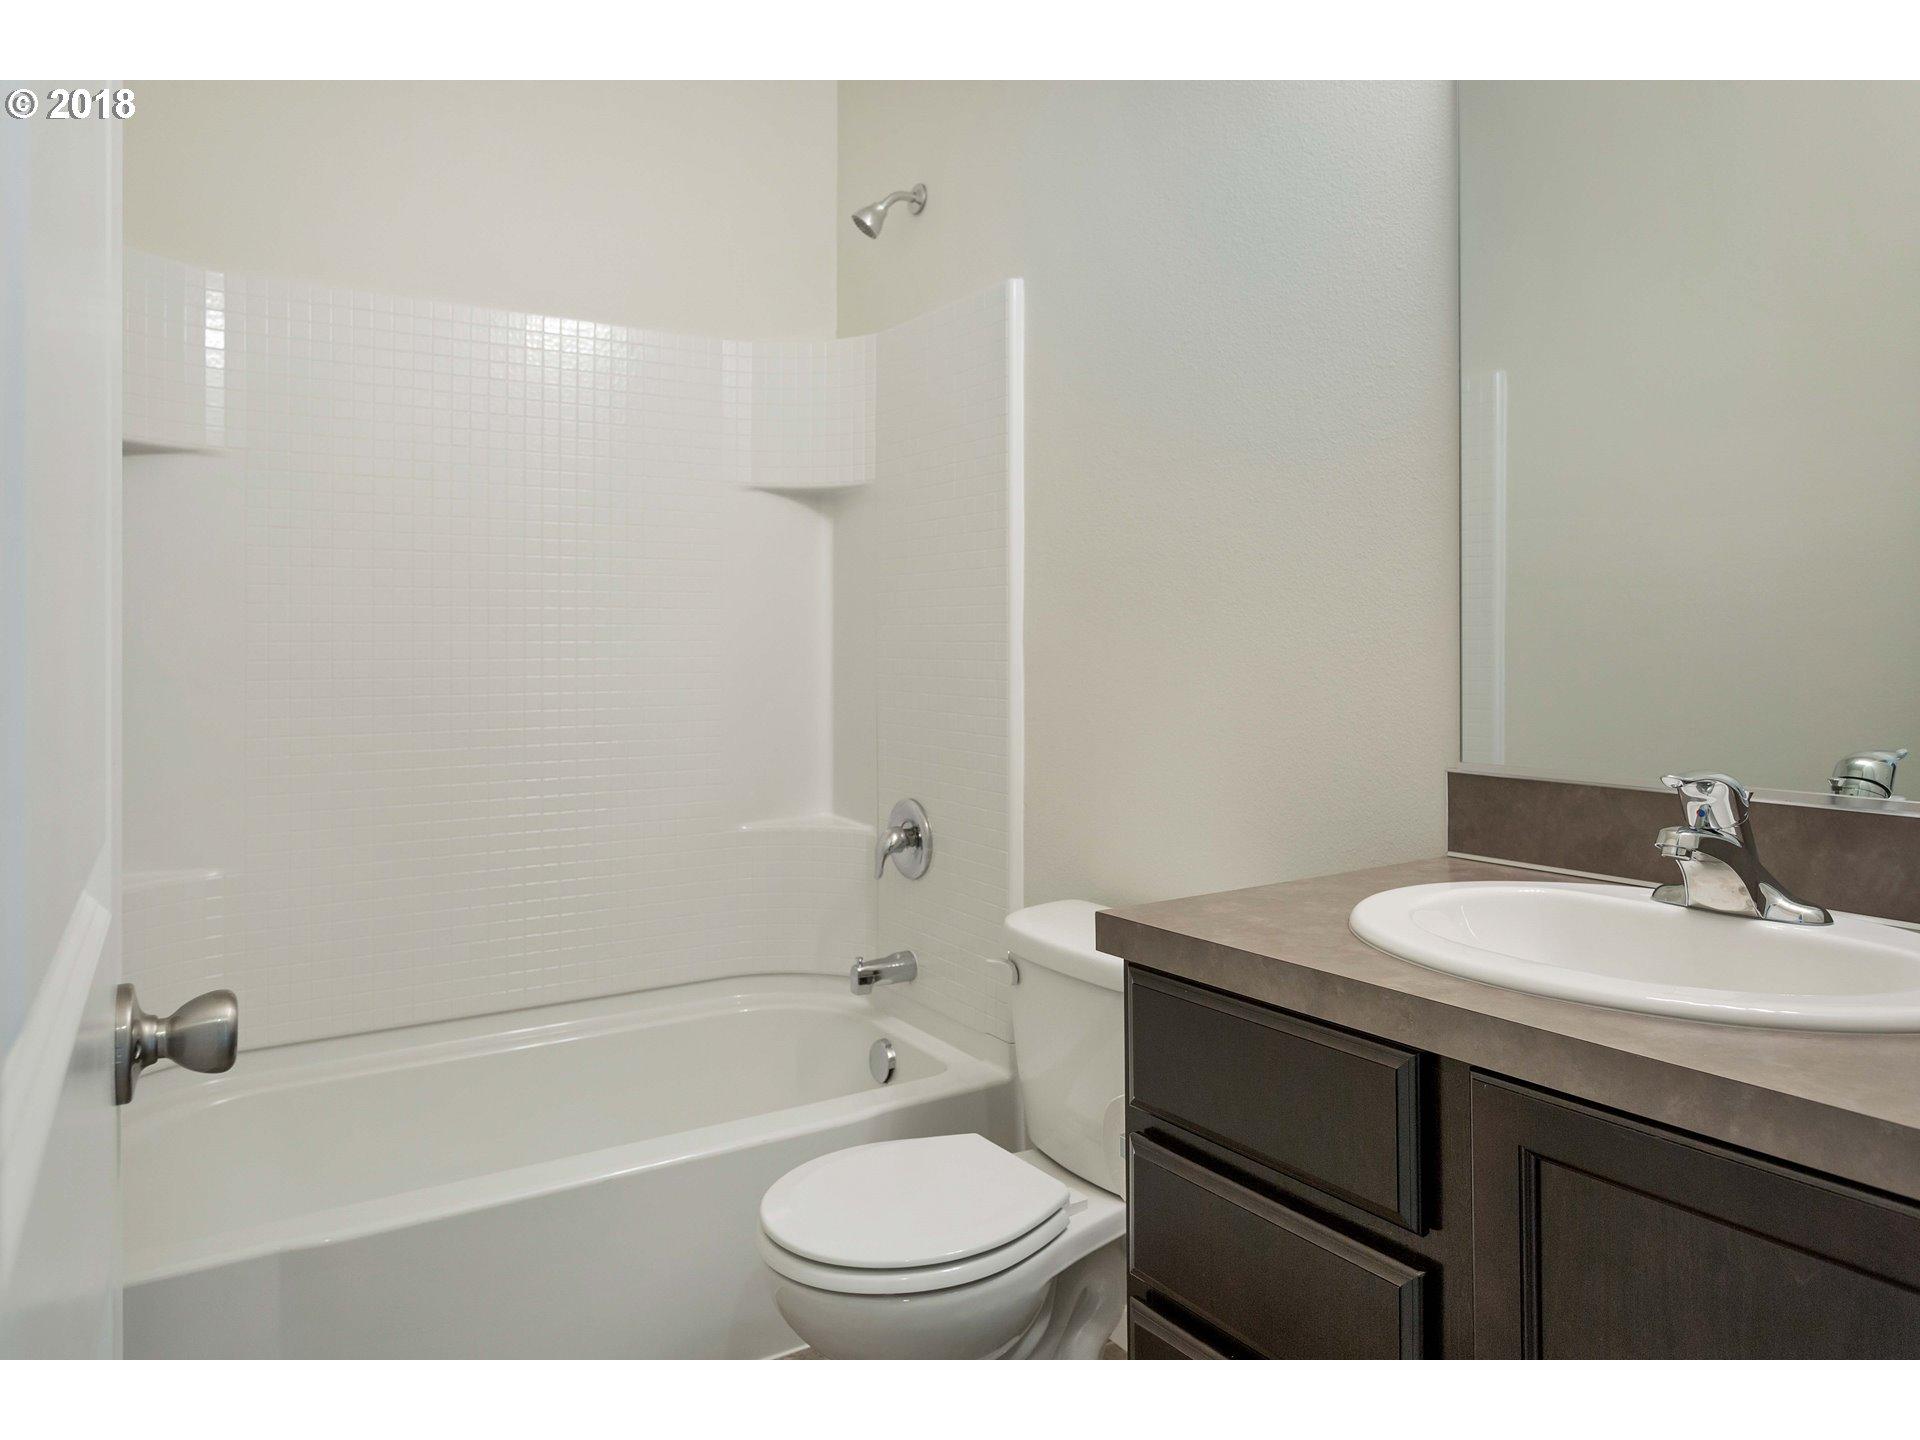 311 DOUG FIR LN Molalla, OR 97038 - MLS #: 18582727